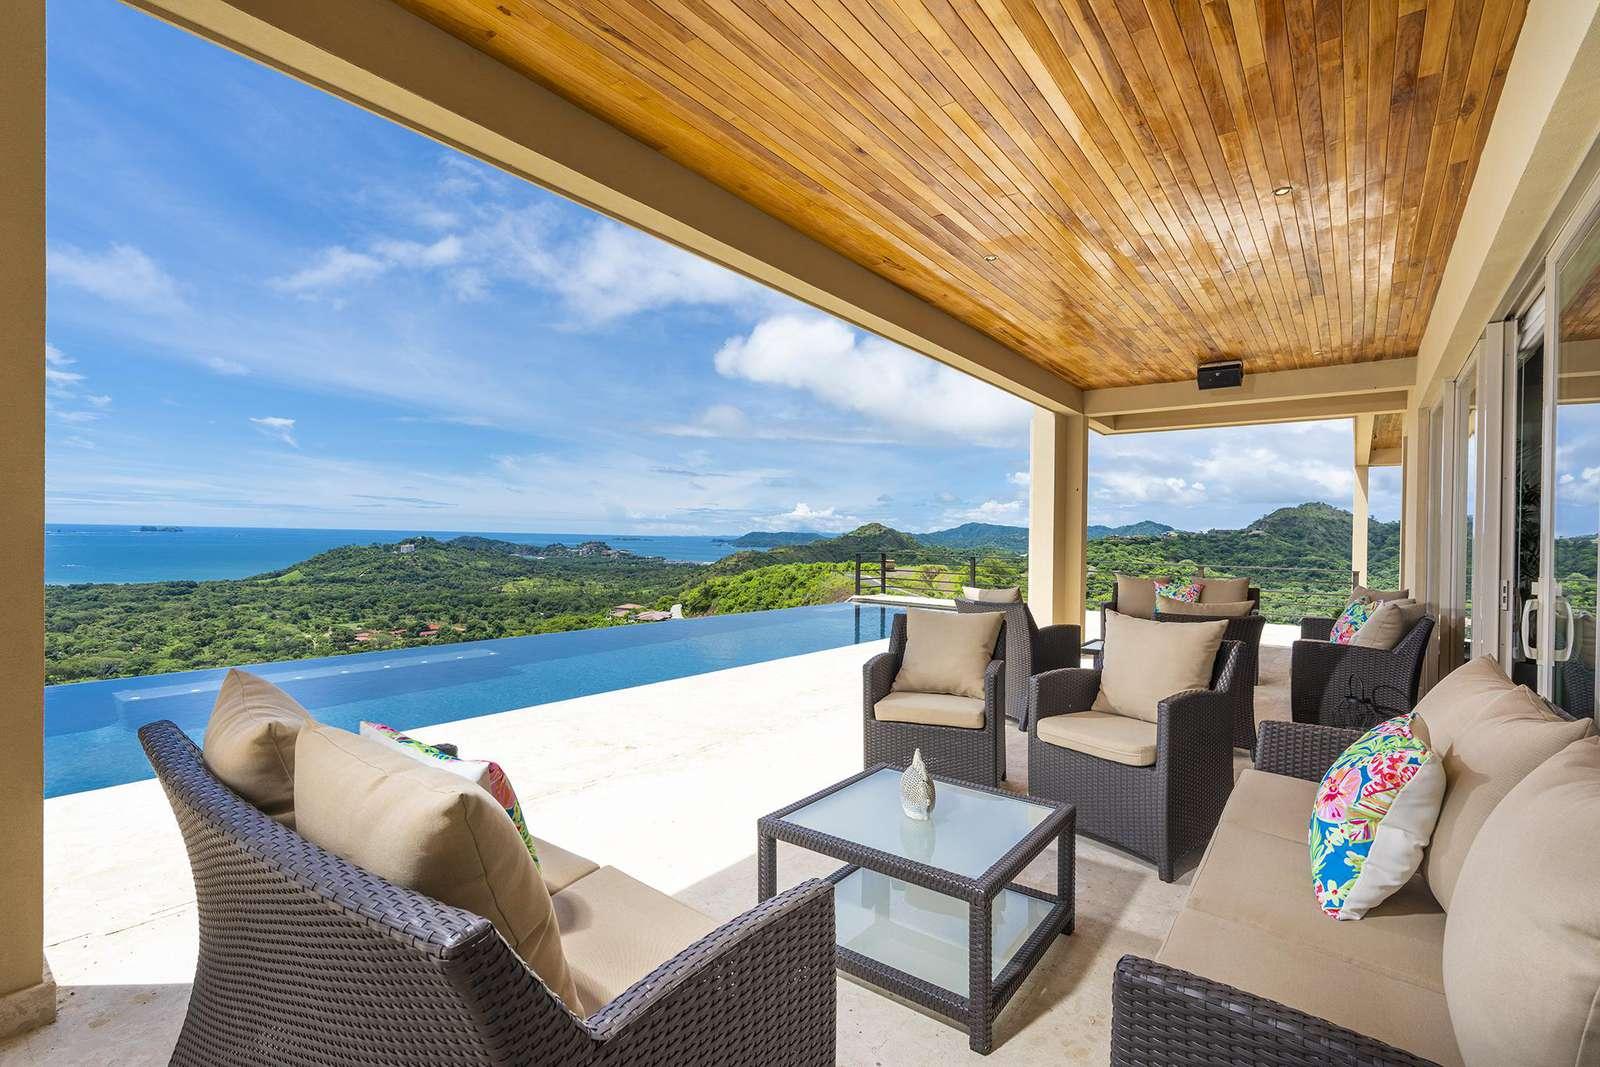 Casa Vista del Rey, million dollar views - property